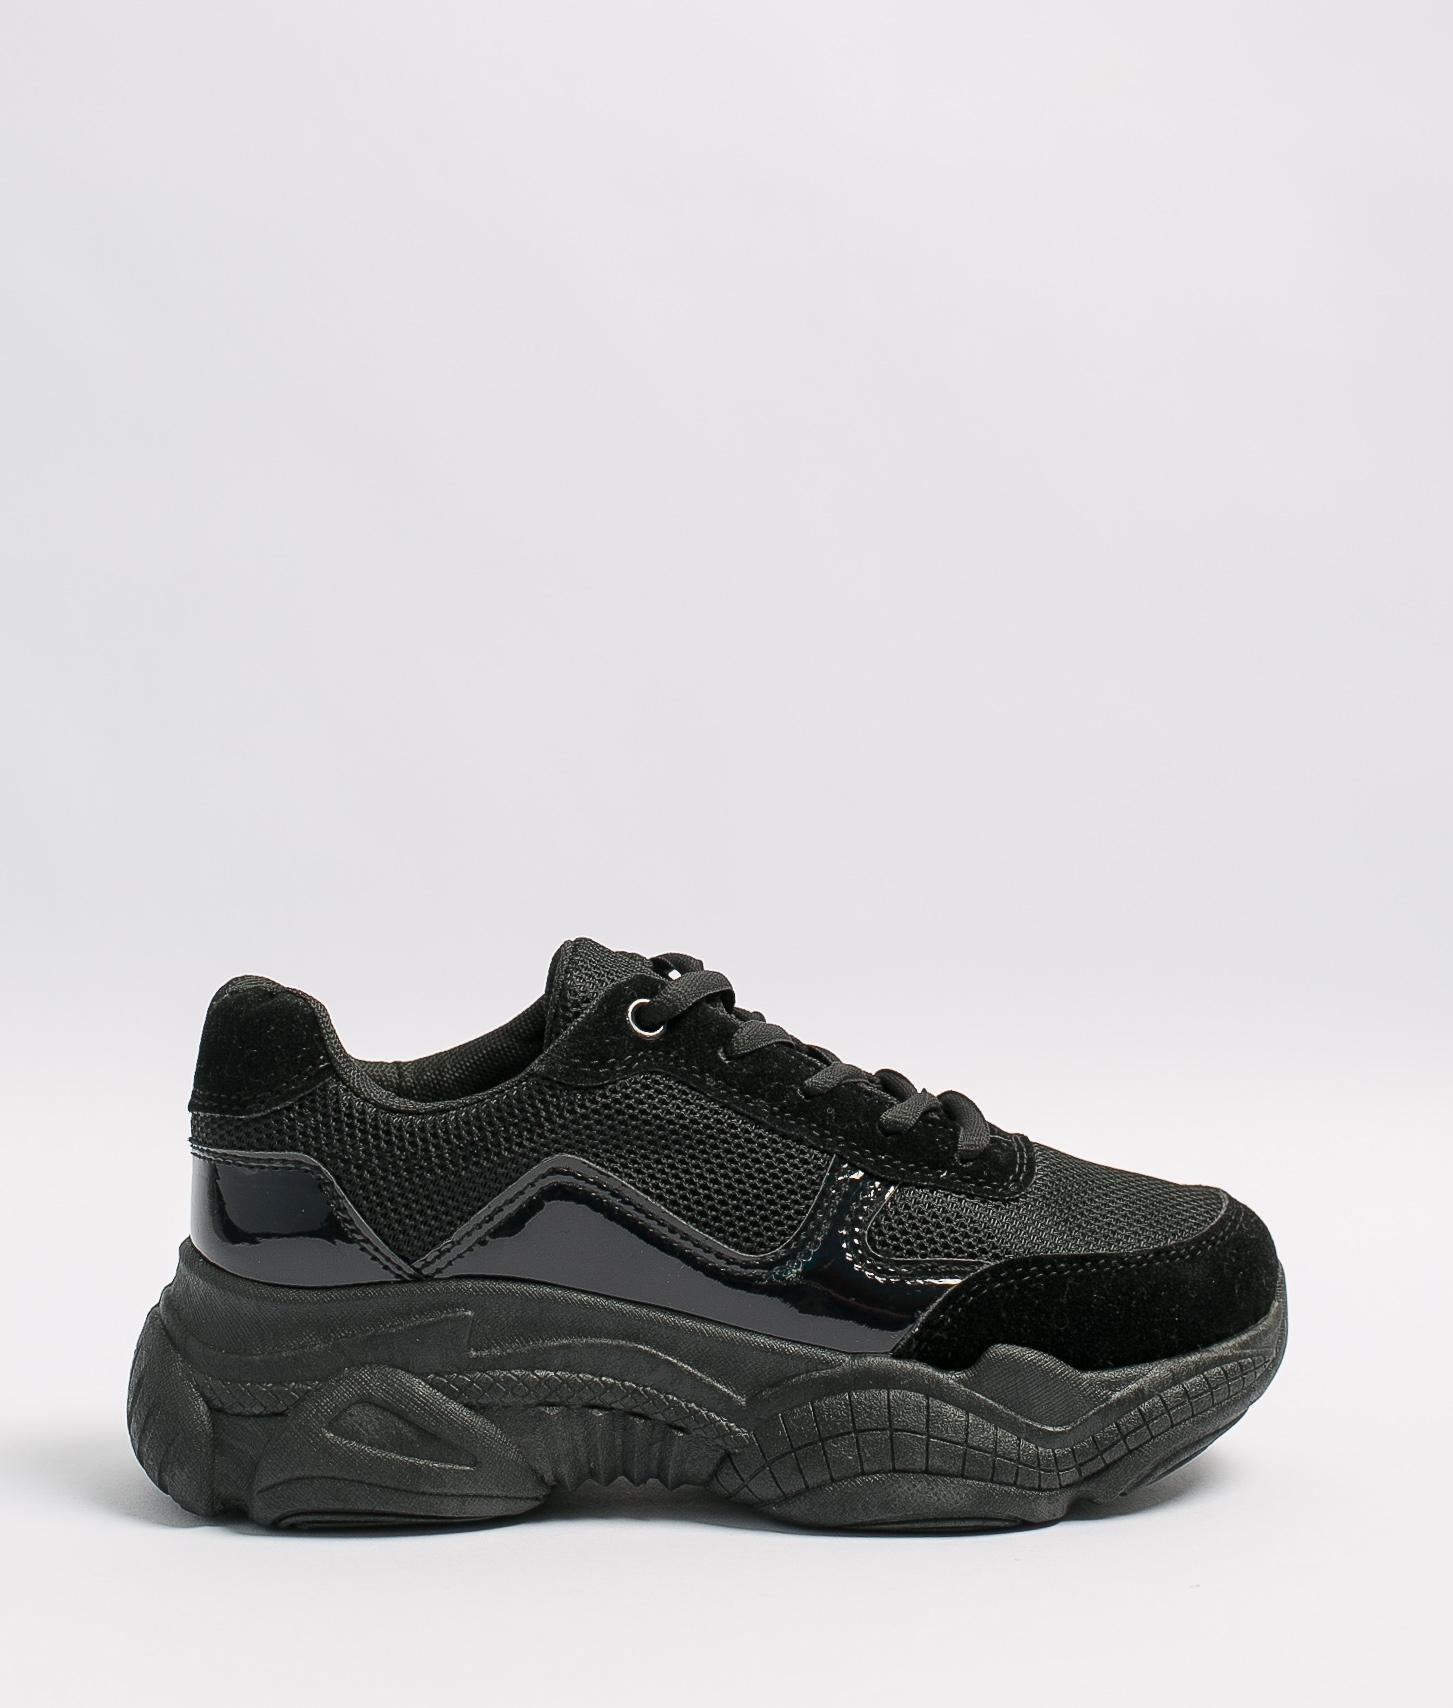 Sneakers Perta - Nero